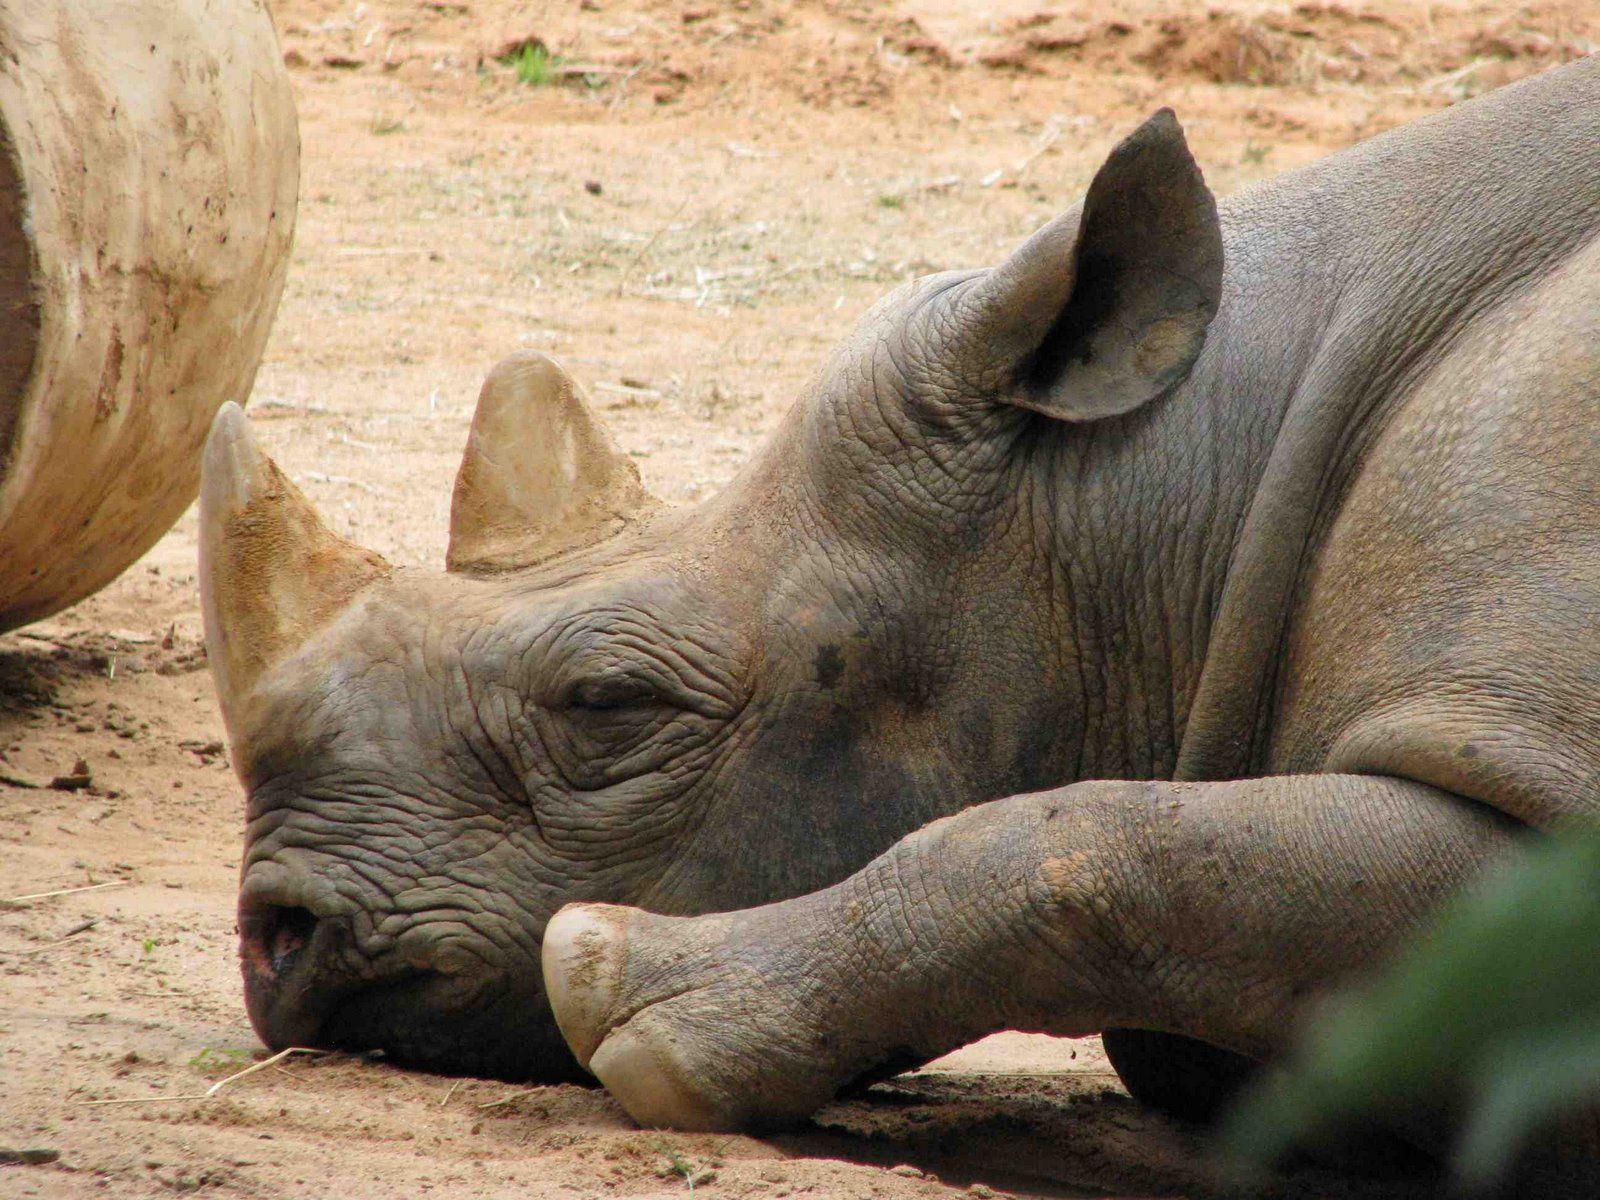 sleeping rhino | at San Diego Zoo | Benjamin Becker | Flickr